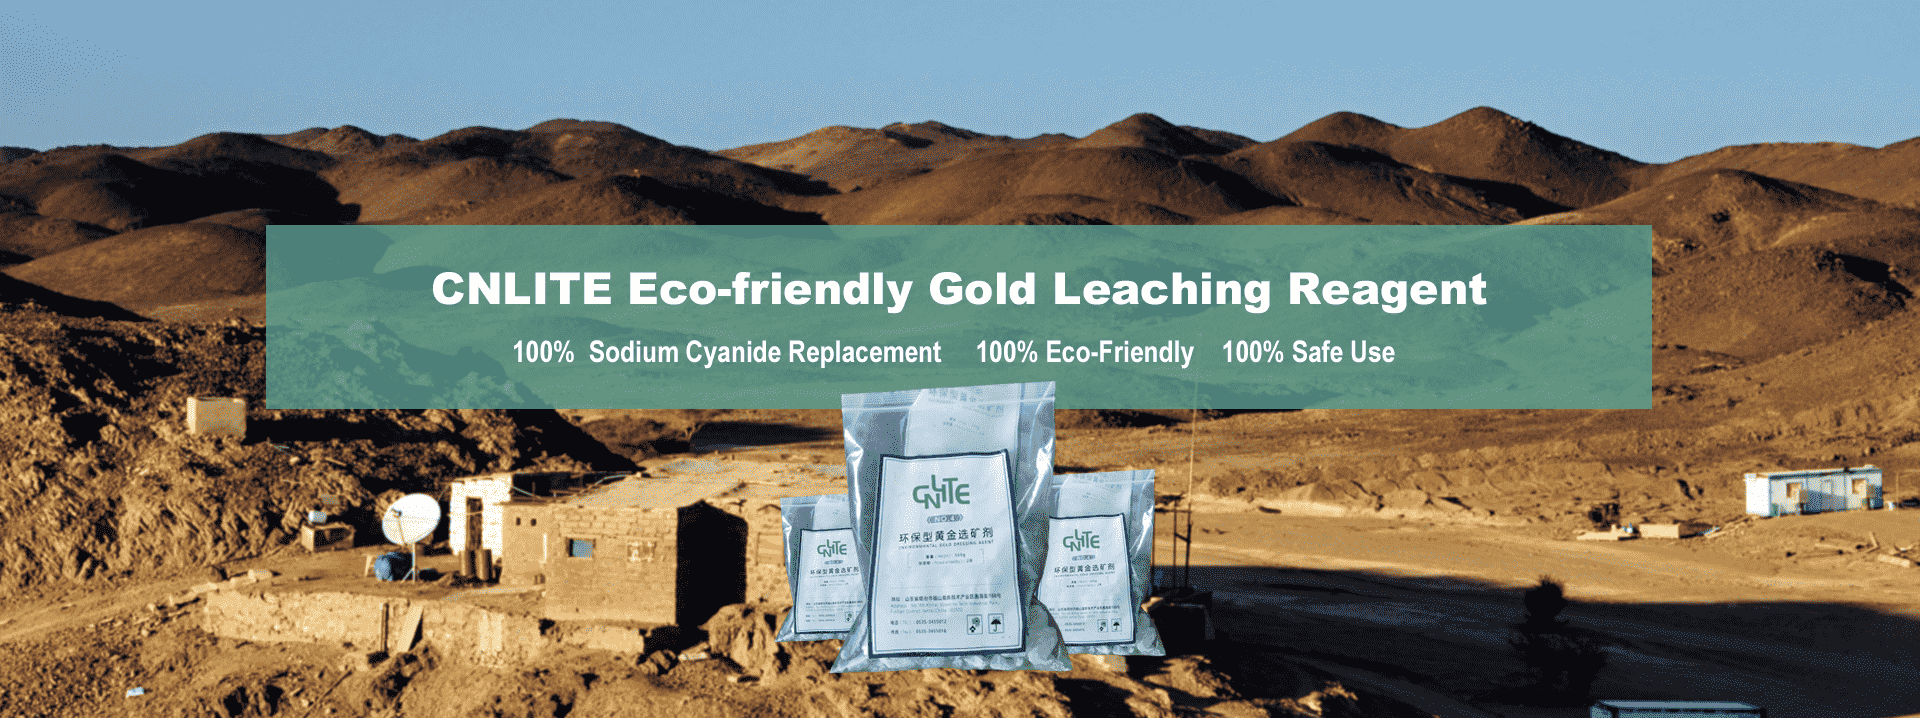 CNLITE gold leaching reagent